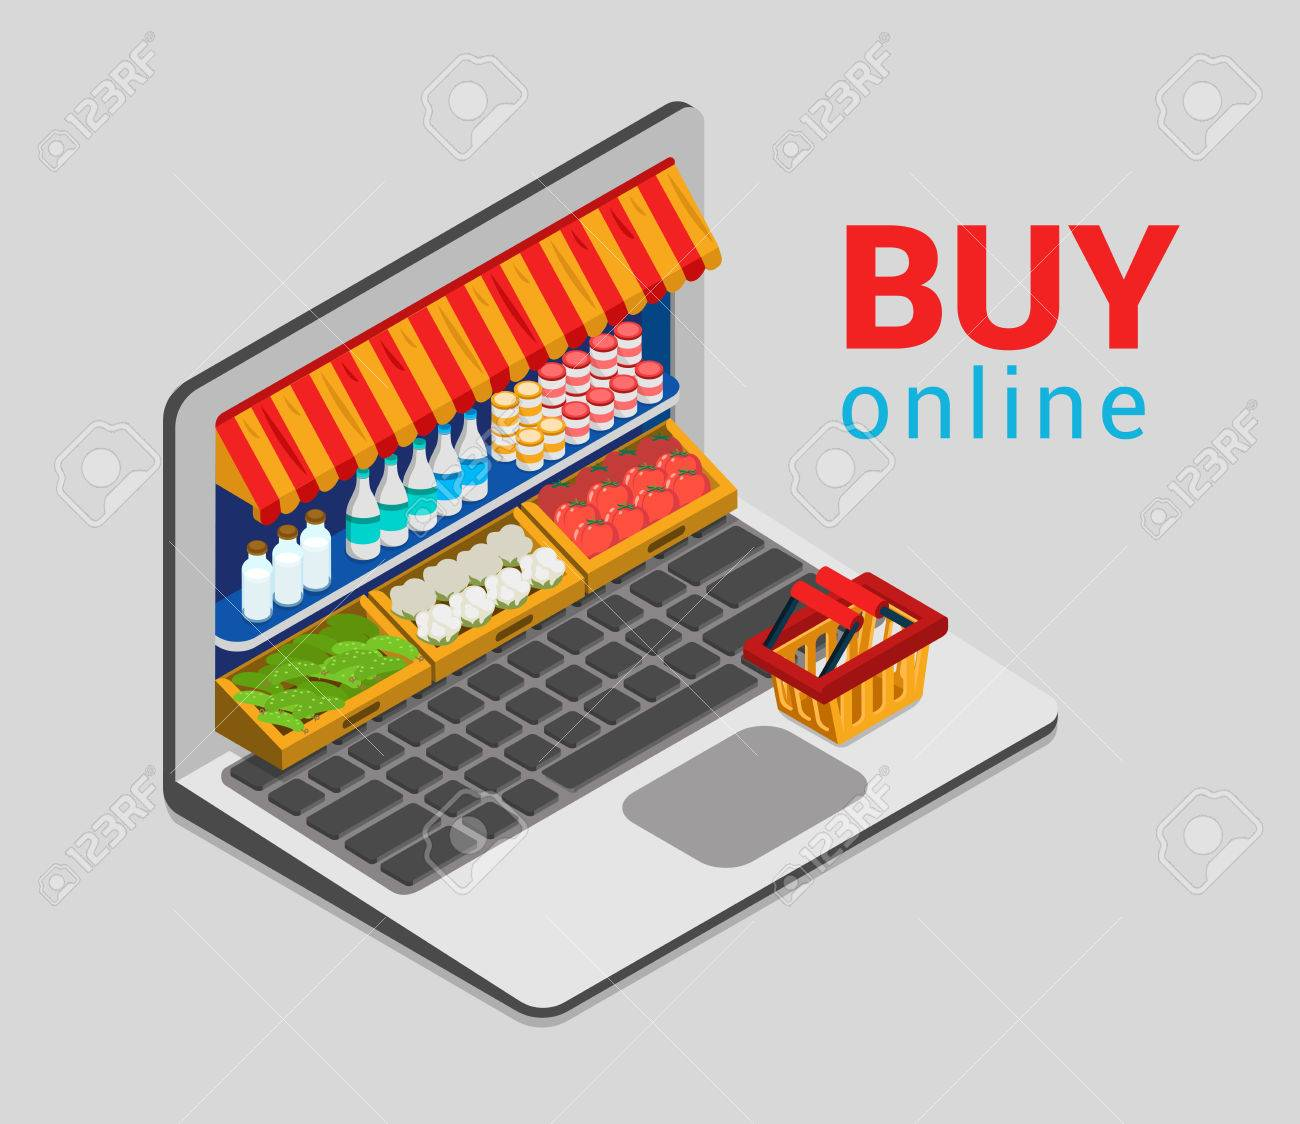 Laptop buy online grocery shopping e-commerce store flat 3d web isometric infographic concept vector electronic business sales. Shop cart market shop showcase product shelving shelf laptop screen. - 56931629